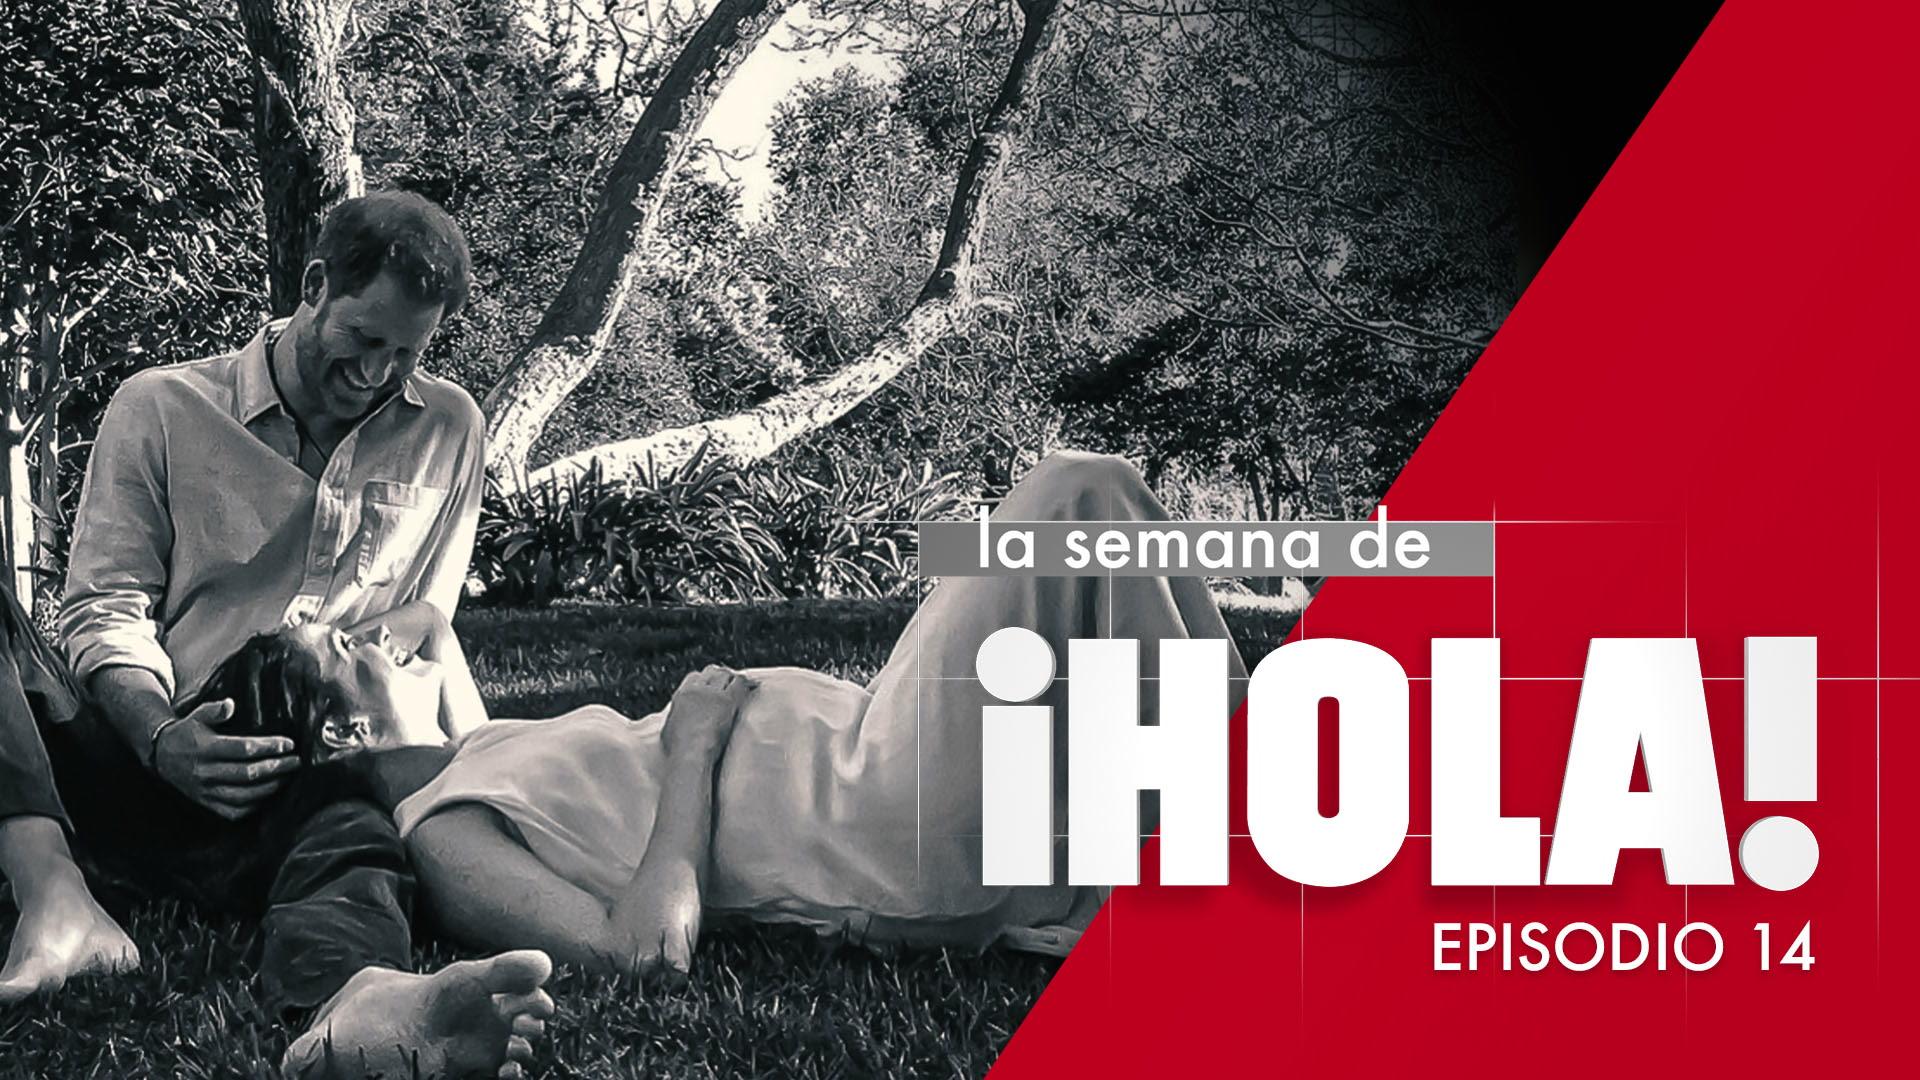 La semana de ¡HOLA! - Episodio 14